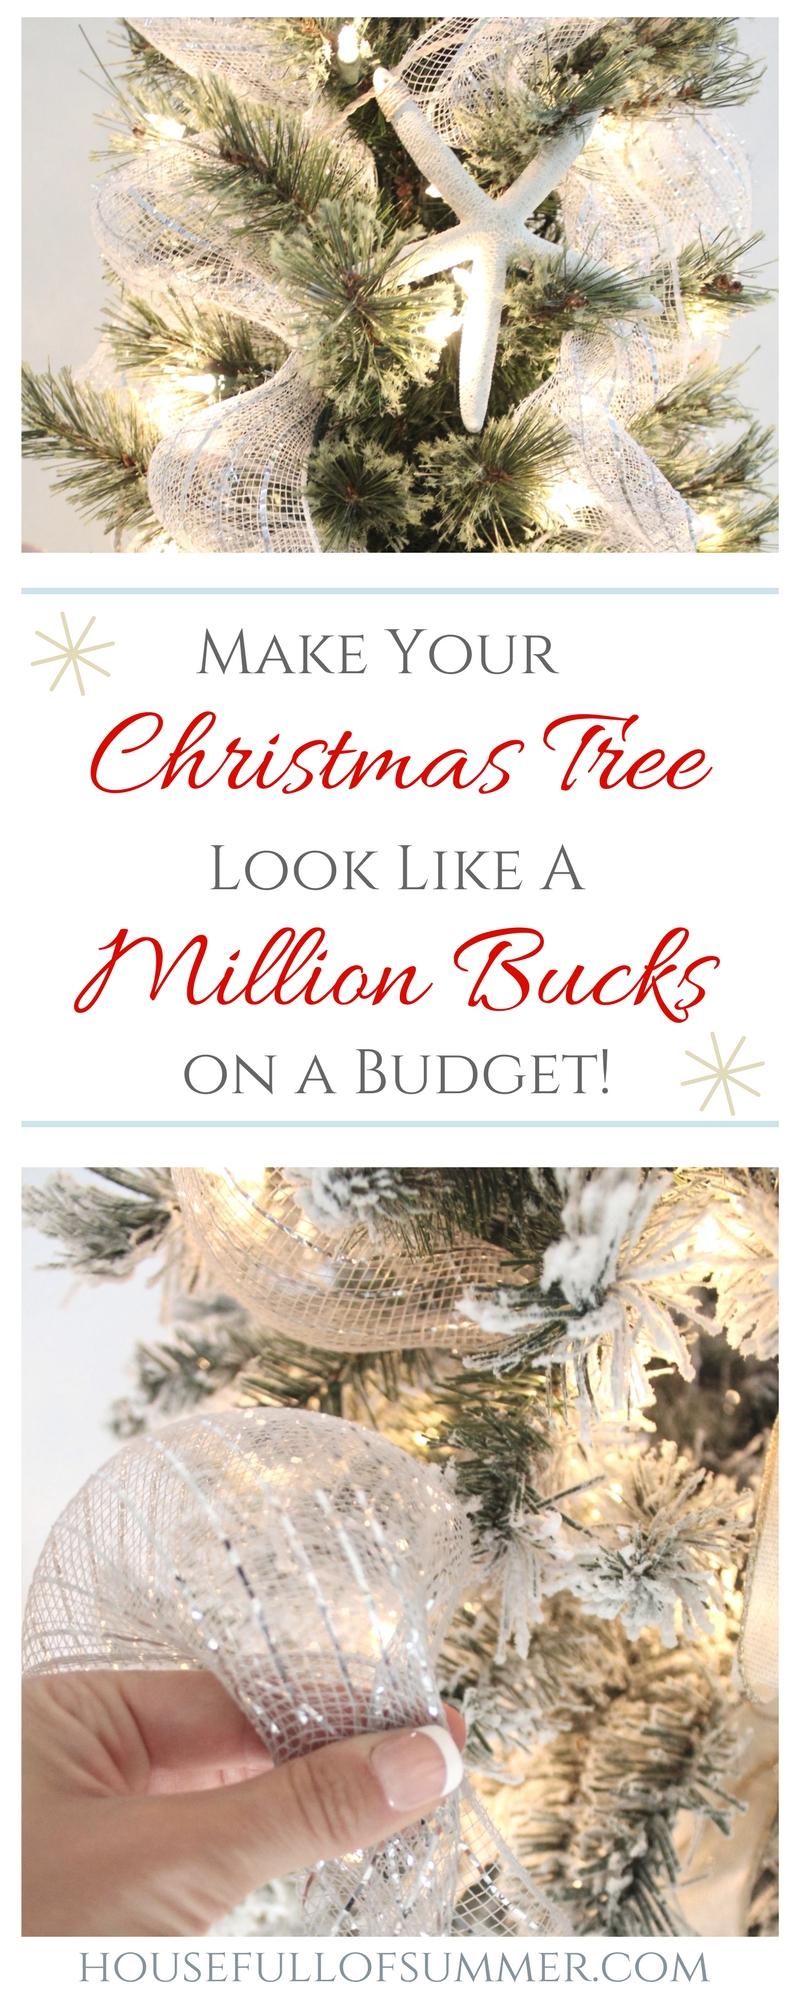 Make Your Christmas Tree Look Like a Million Bucks on a Budget | House Full of Summer blog - christmas tree styling, how to decorate a christmas tree, christmas tree tips, ideas, holiday decor, coastal home and lifestyle, diy christmas tips